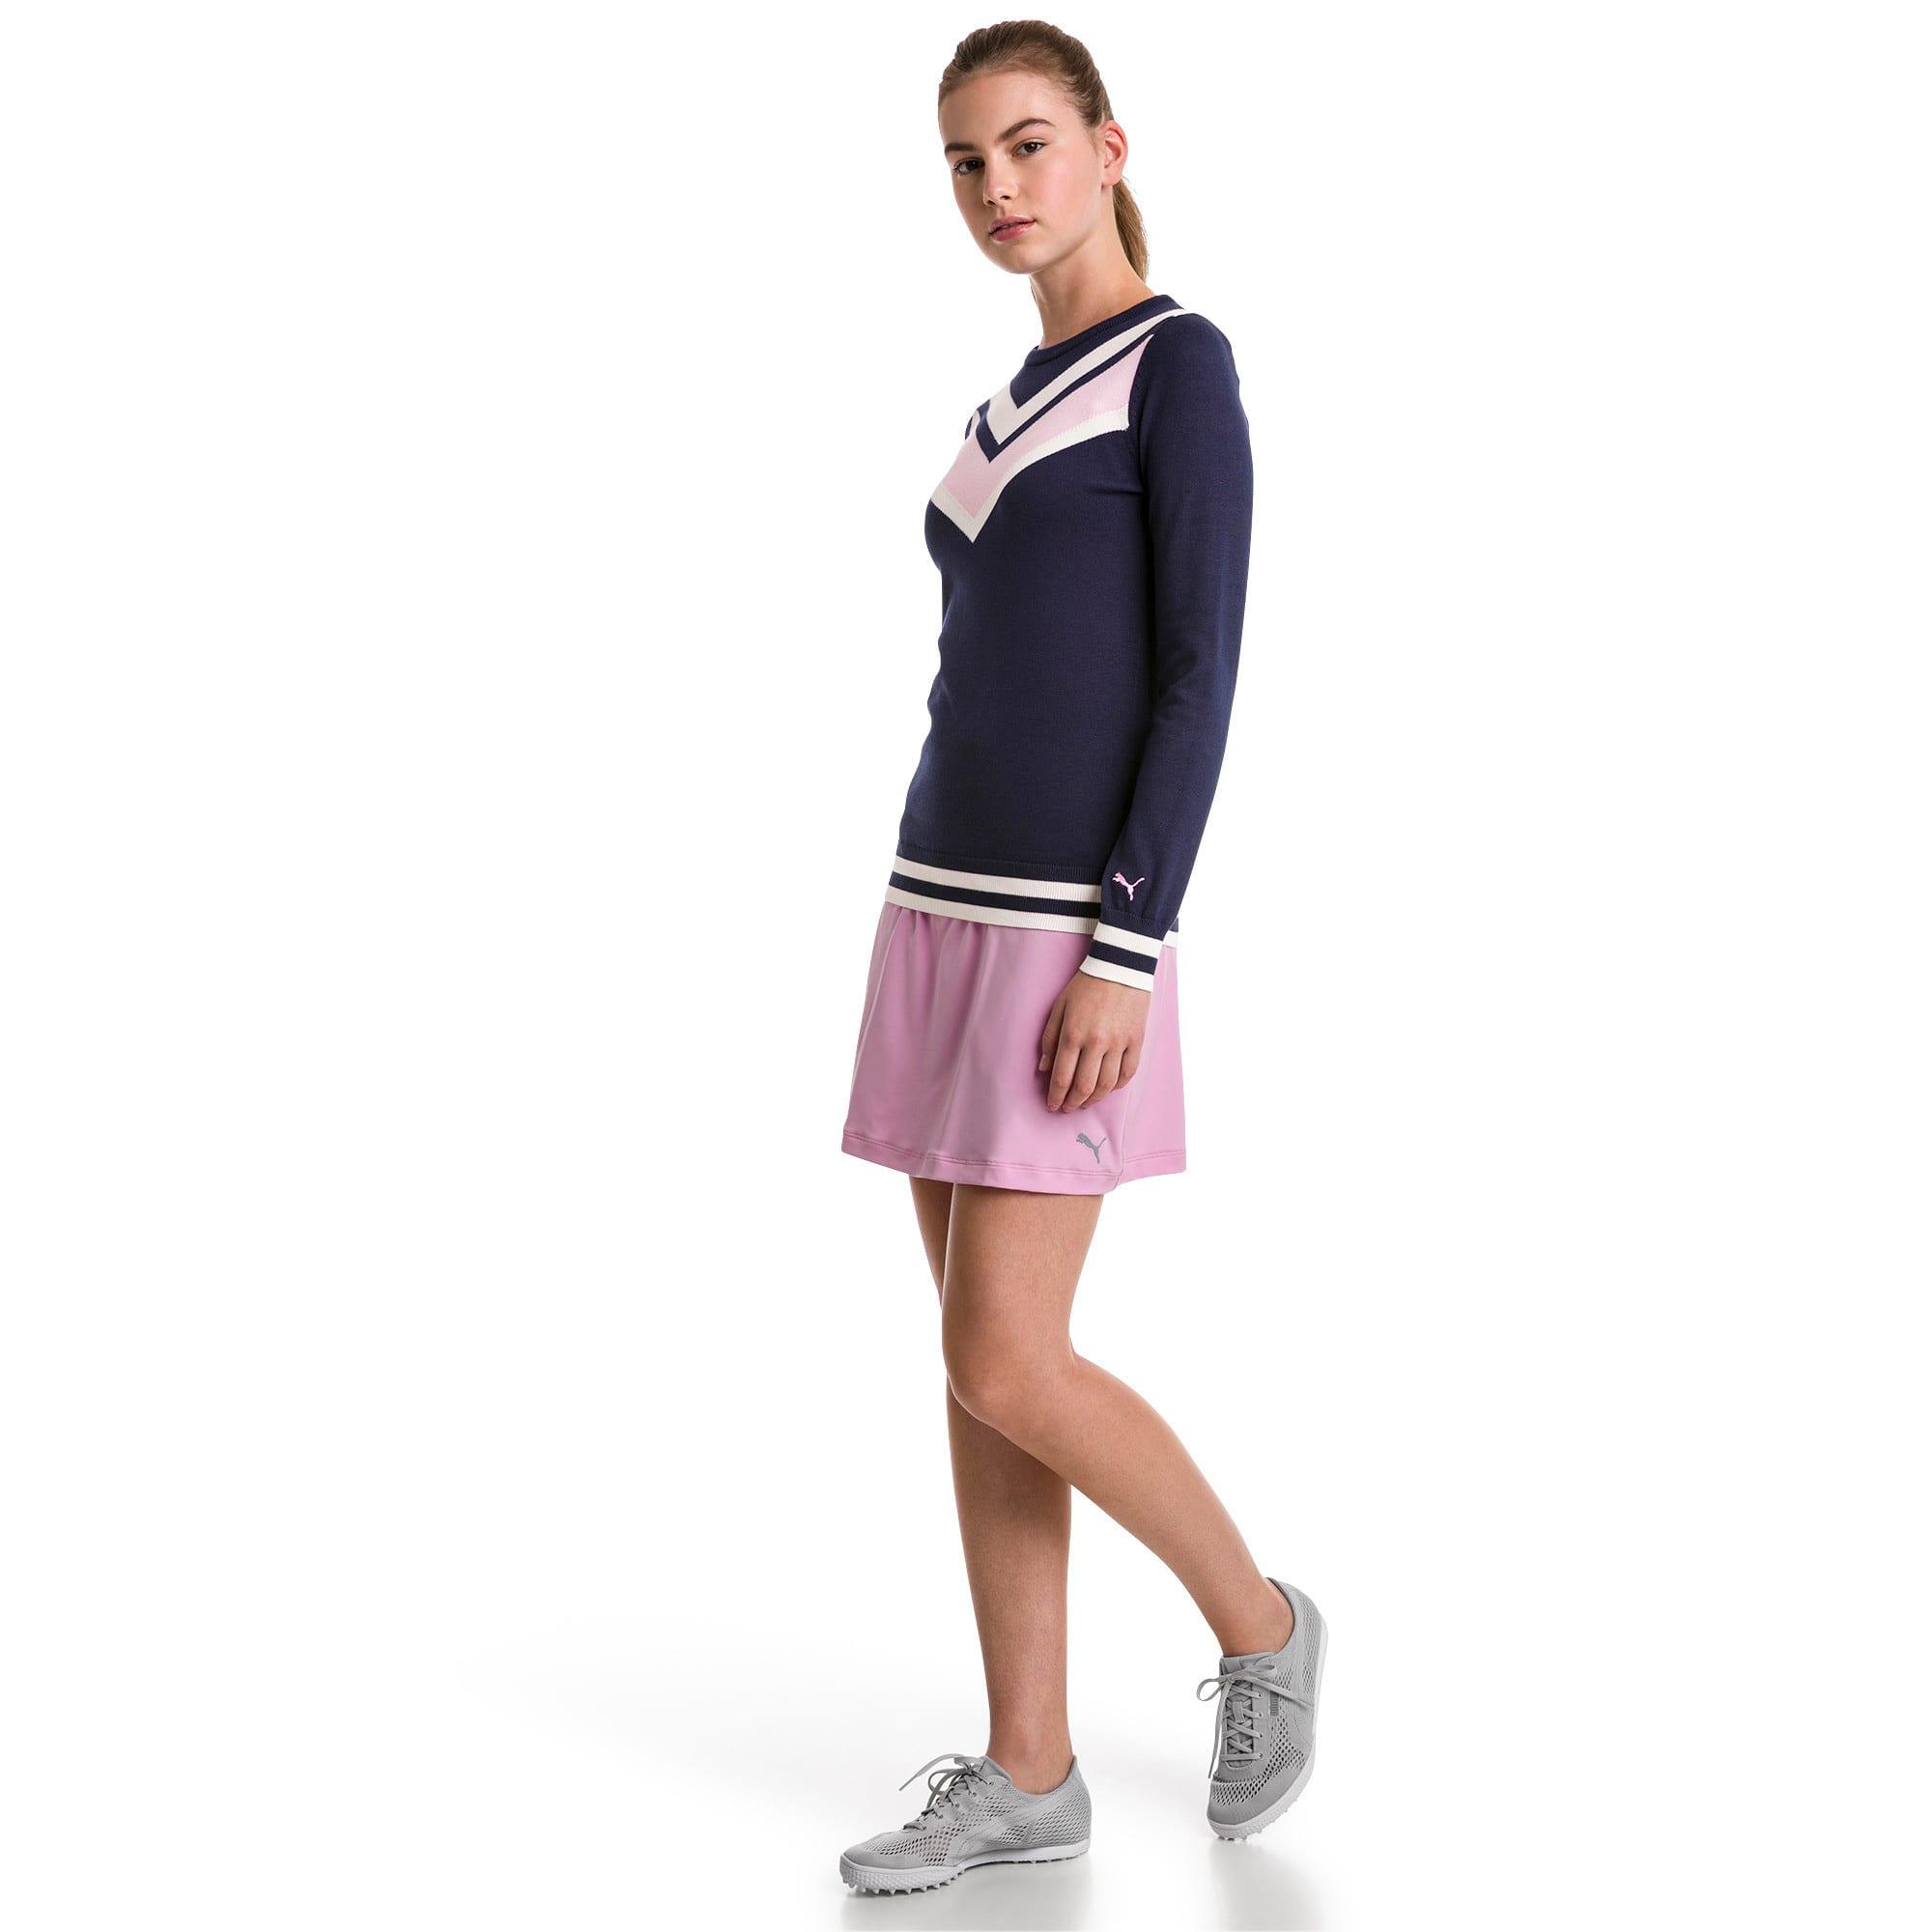 Thumbnail 3 of Chevron Women's Golf Sweater, Peacoat, medium